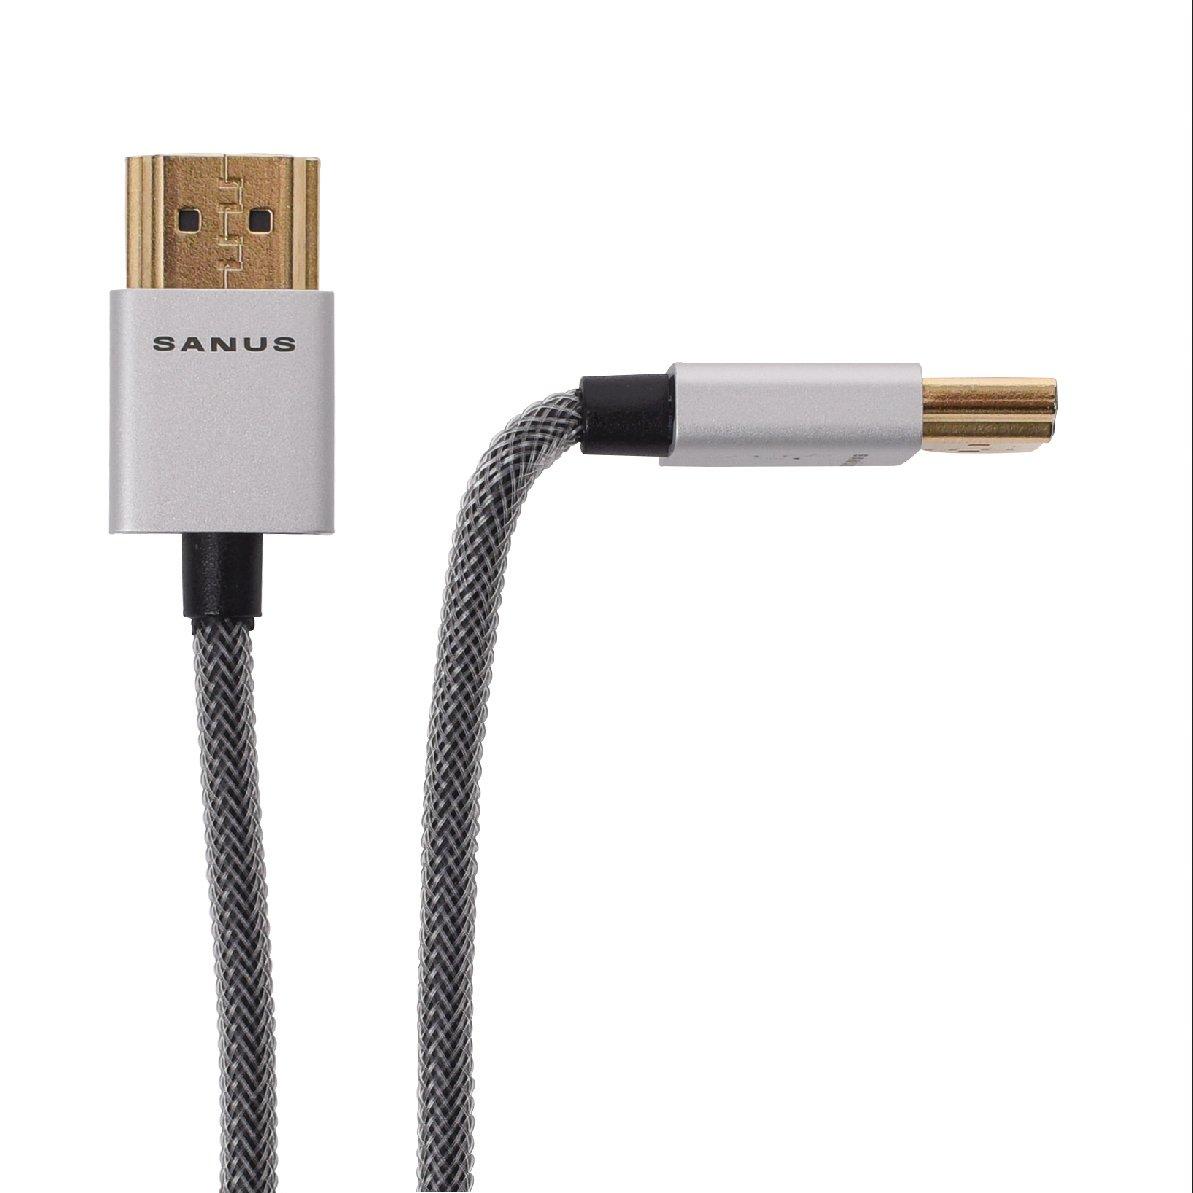 Sanus Super Slim 8' HDMI cable - 8 Feet - 18 Gbps High-Speed Supports Full 1080P, 4K, UltraHD, 3D, Ethernet, and Audio Return Channel - SOA-SH8 FBA_SOA-SH8